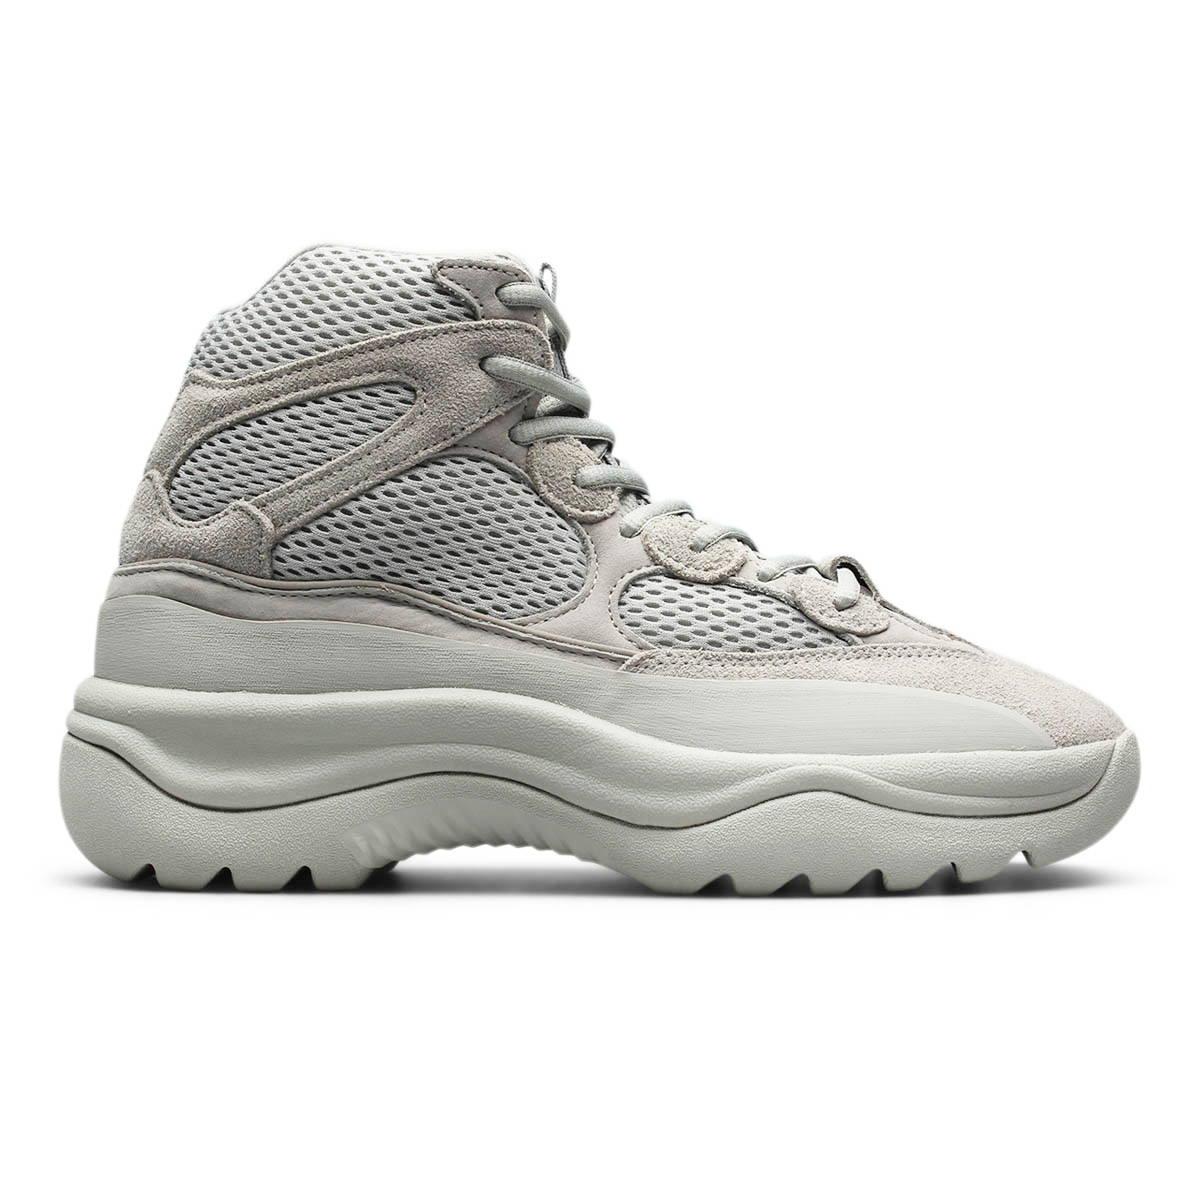 on sale 89255 dded0 9/14/19: adidas Yeezy Desert Boot – Bodega